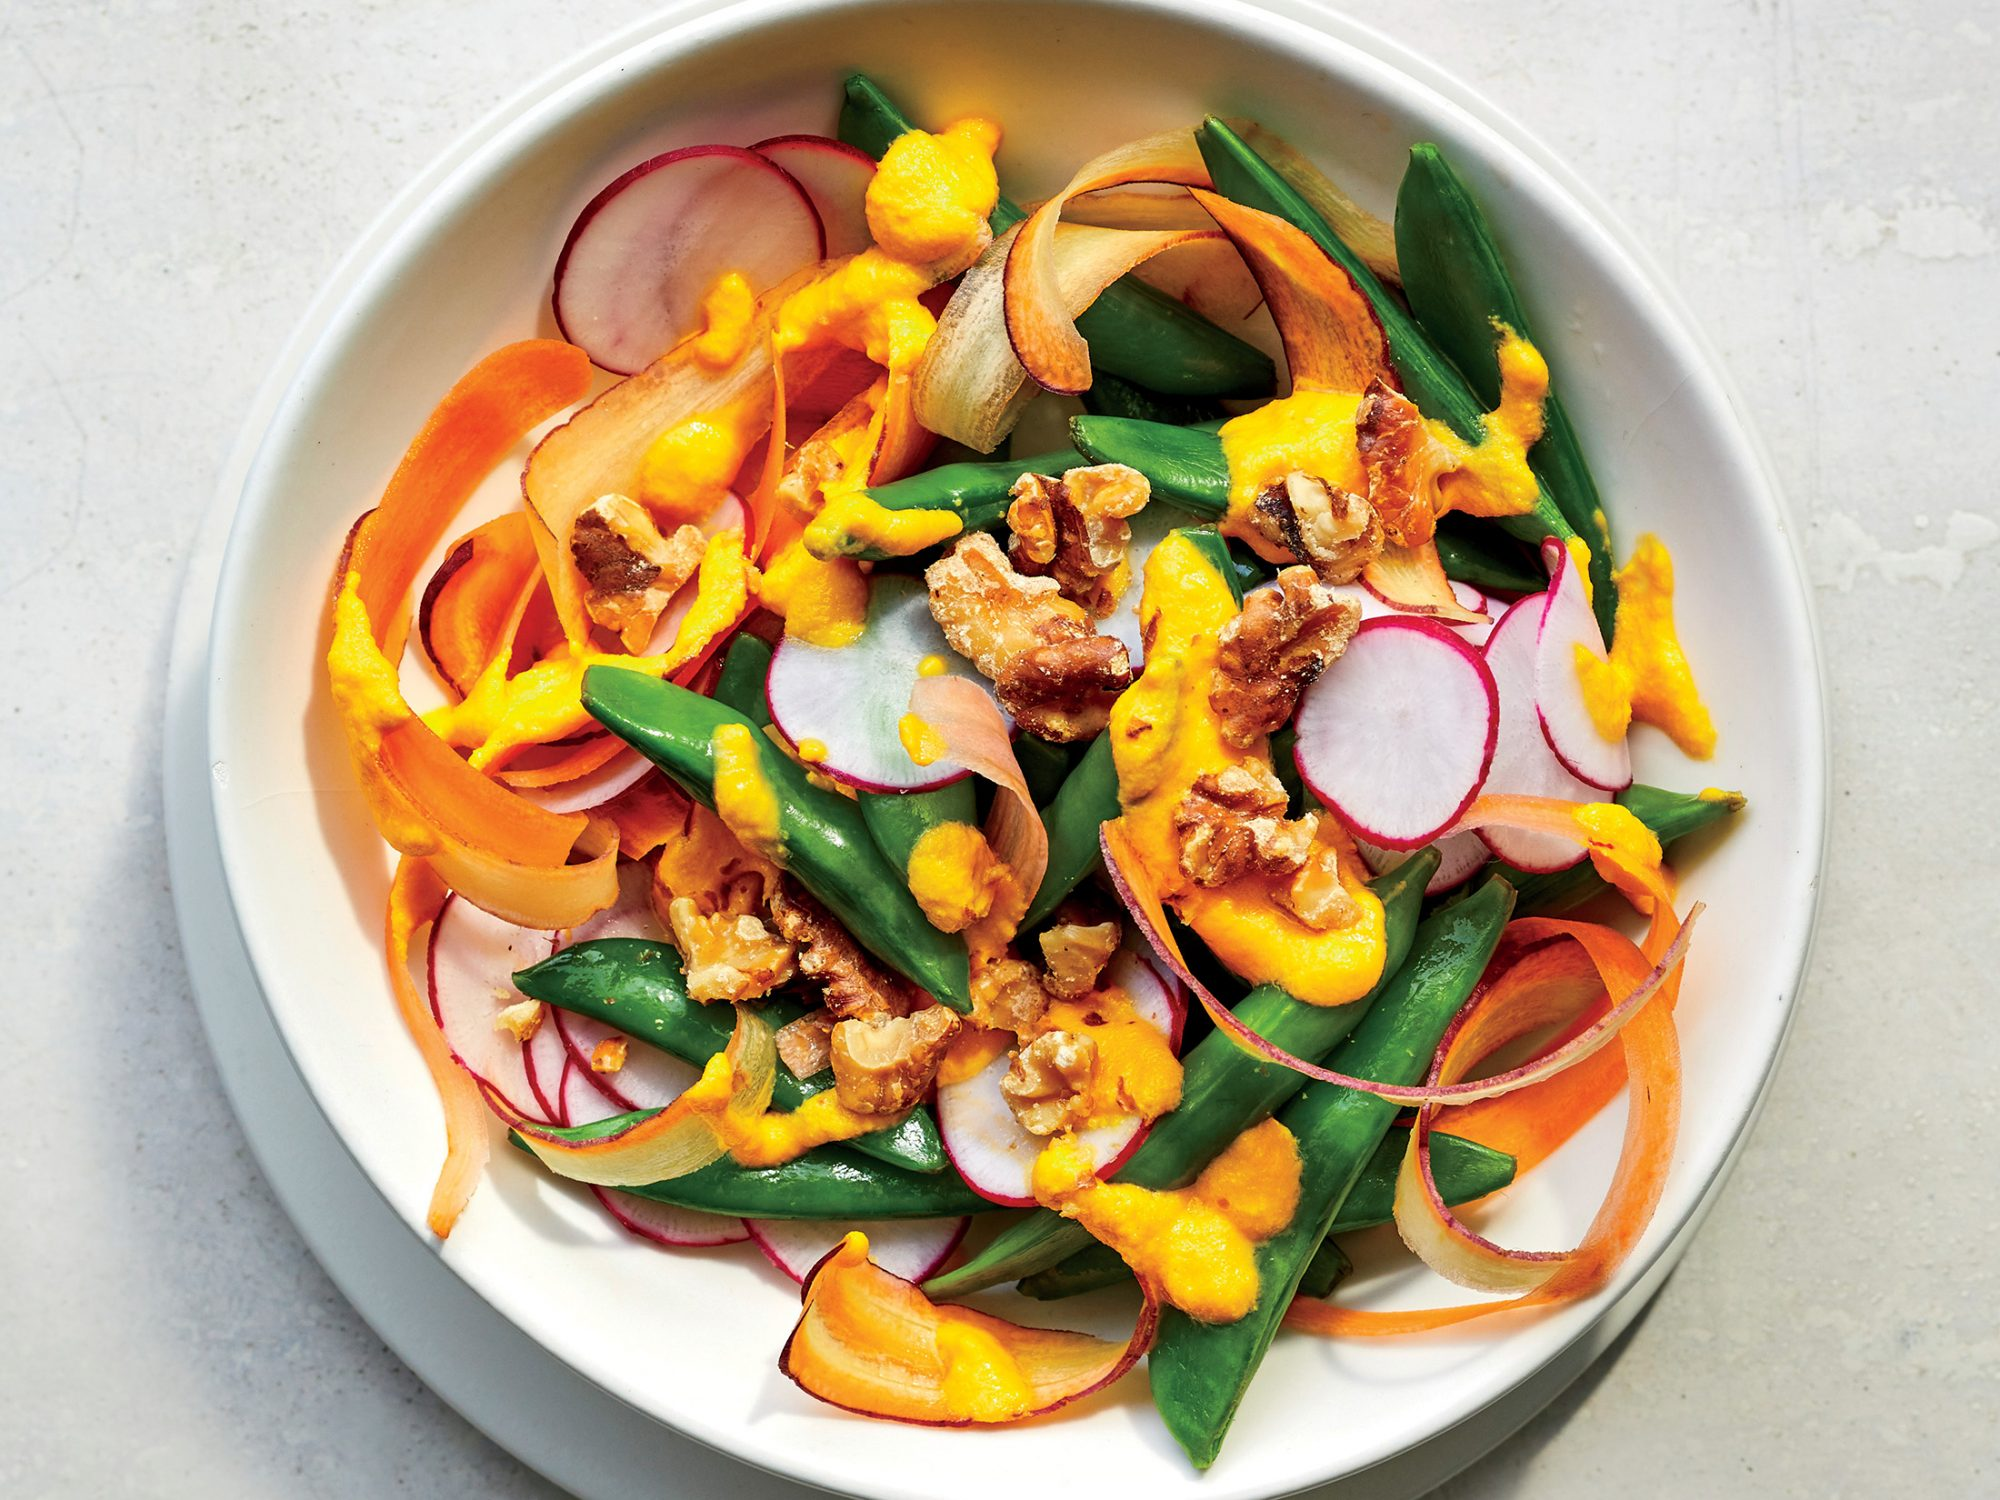 Pea, Radish, and Carrot Salad